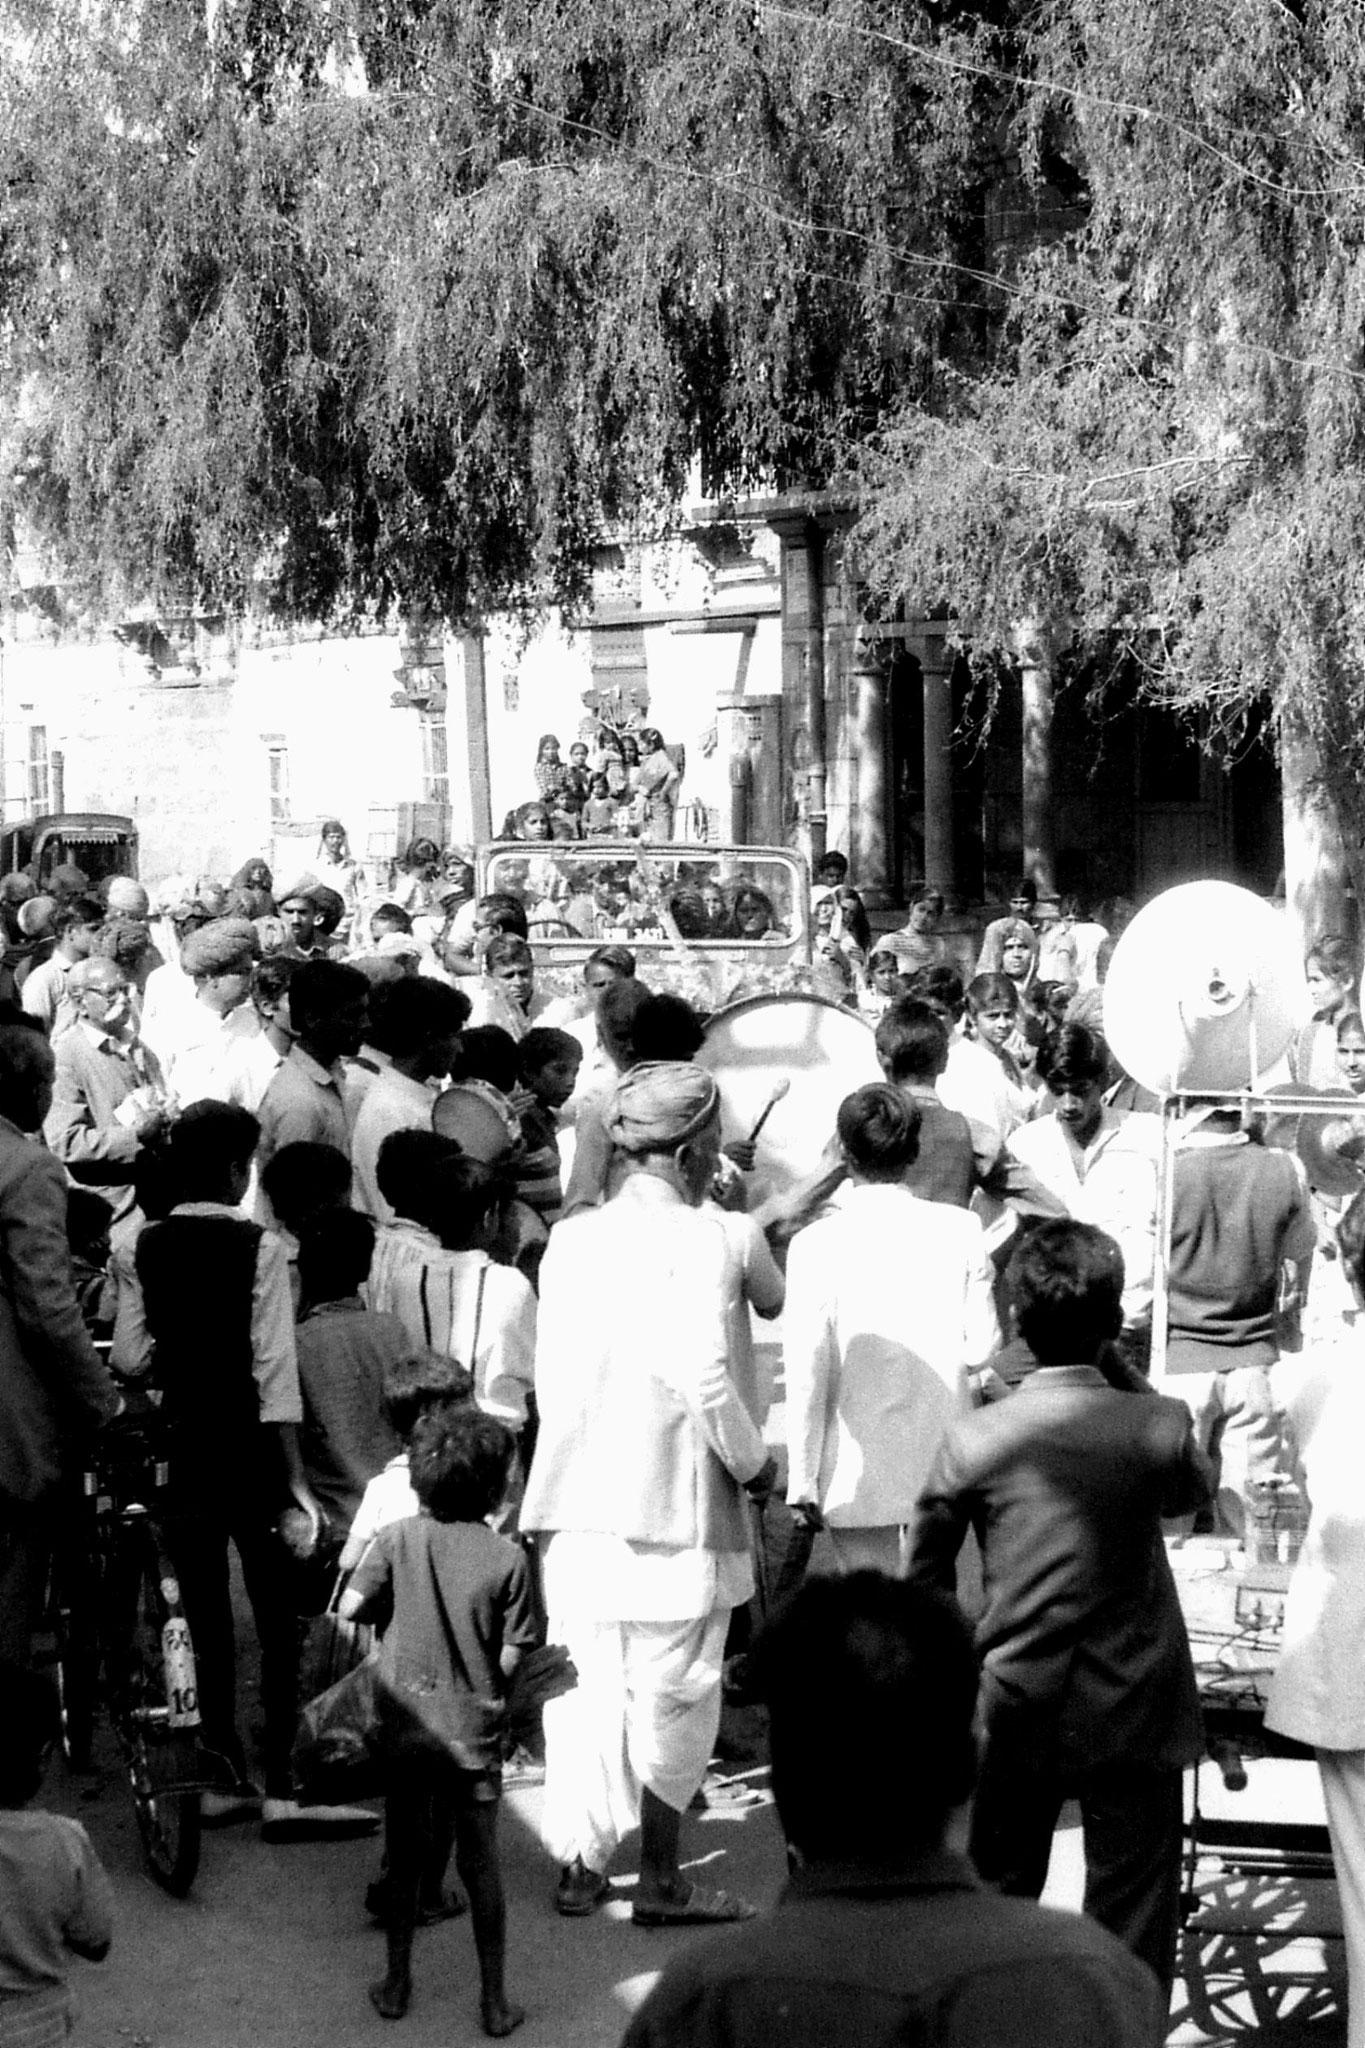 3/12/1989: 32: Jaisalmer wedding procession